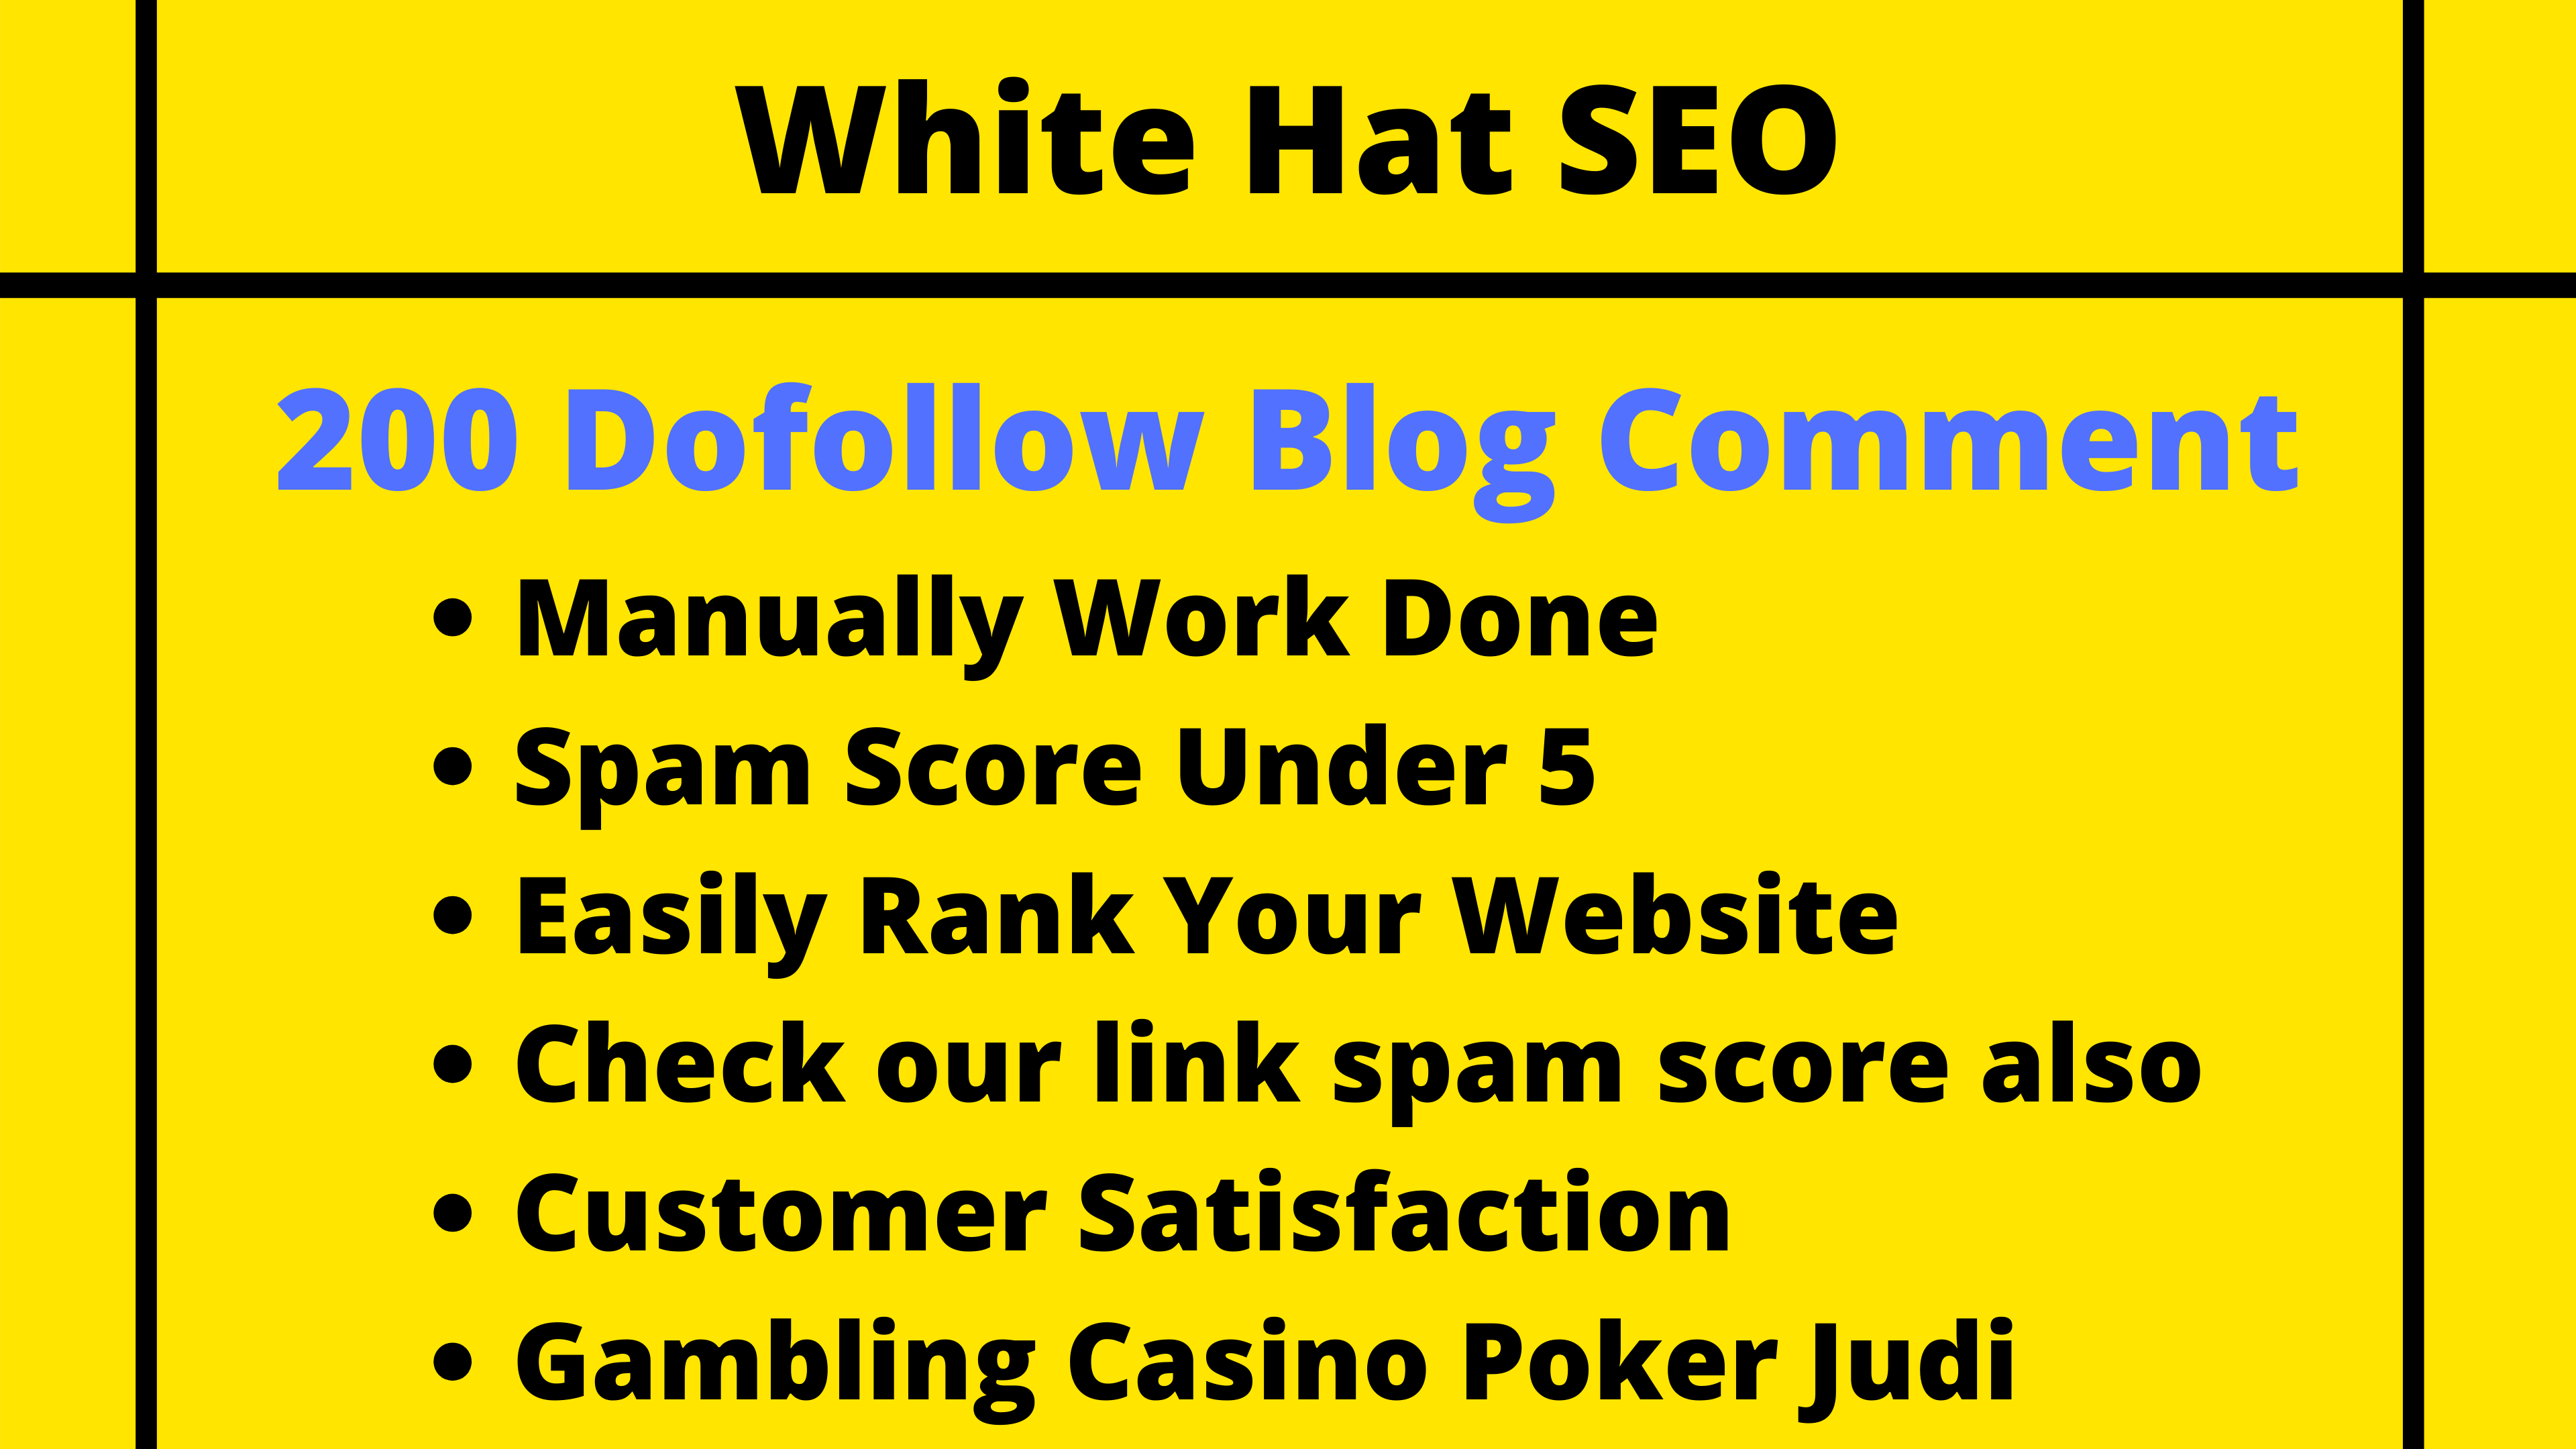 200 blog comment white hat seo backlinks high da sites